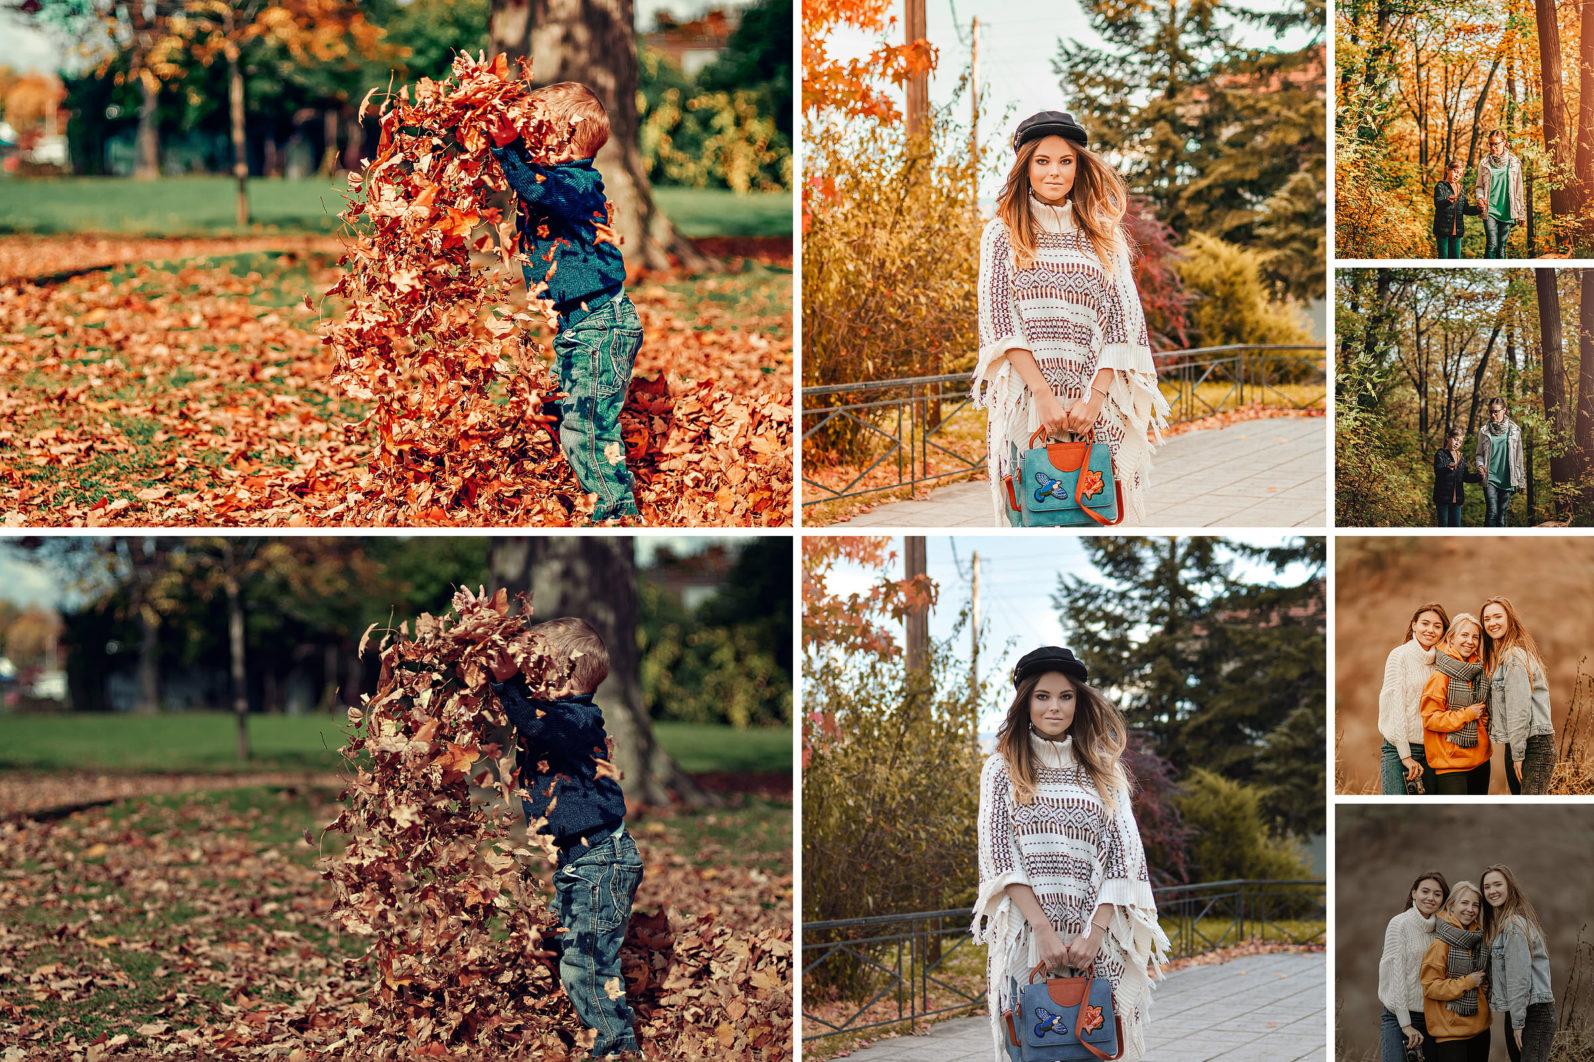 19. Winter & Fall - 19.WINTERFALL 10 -